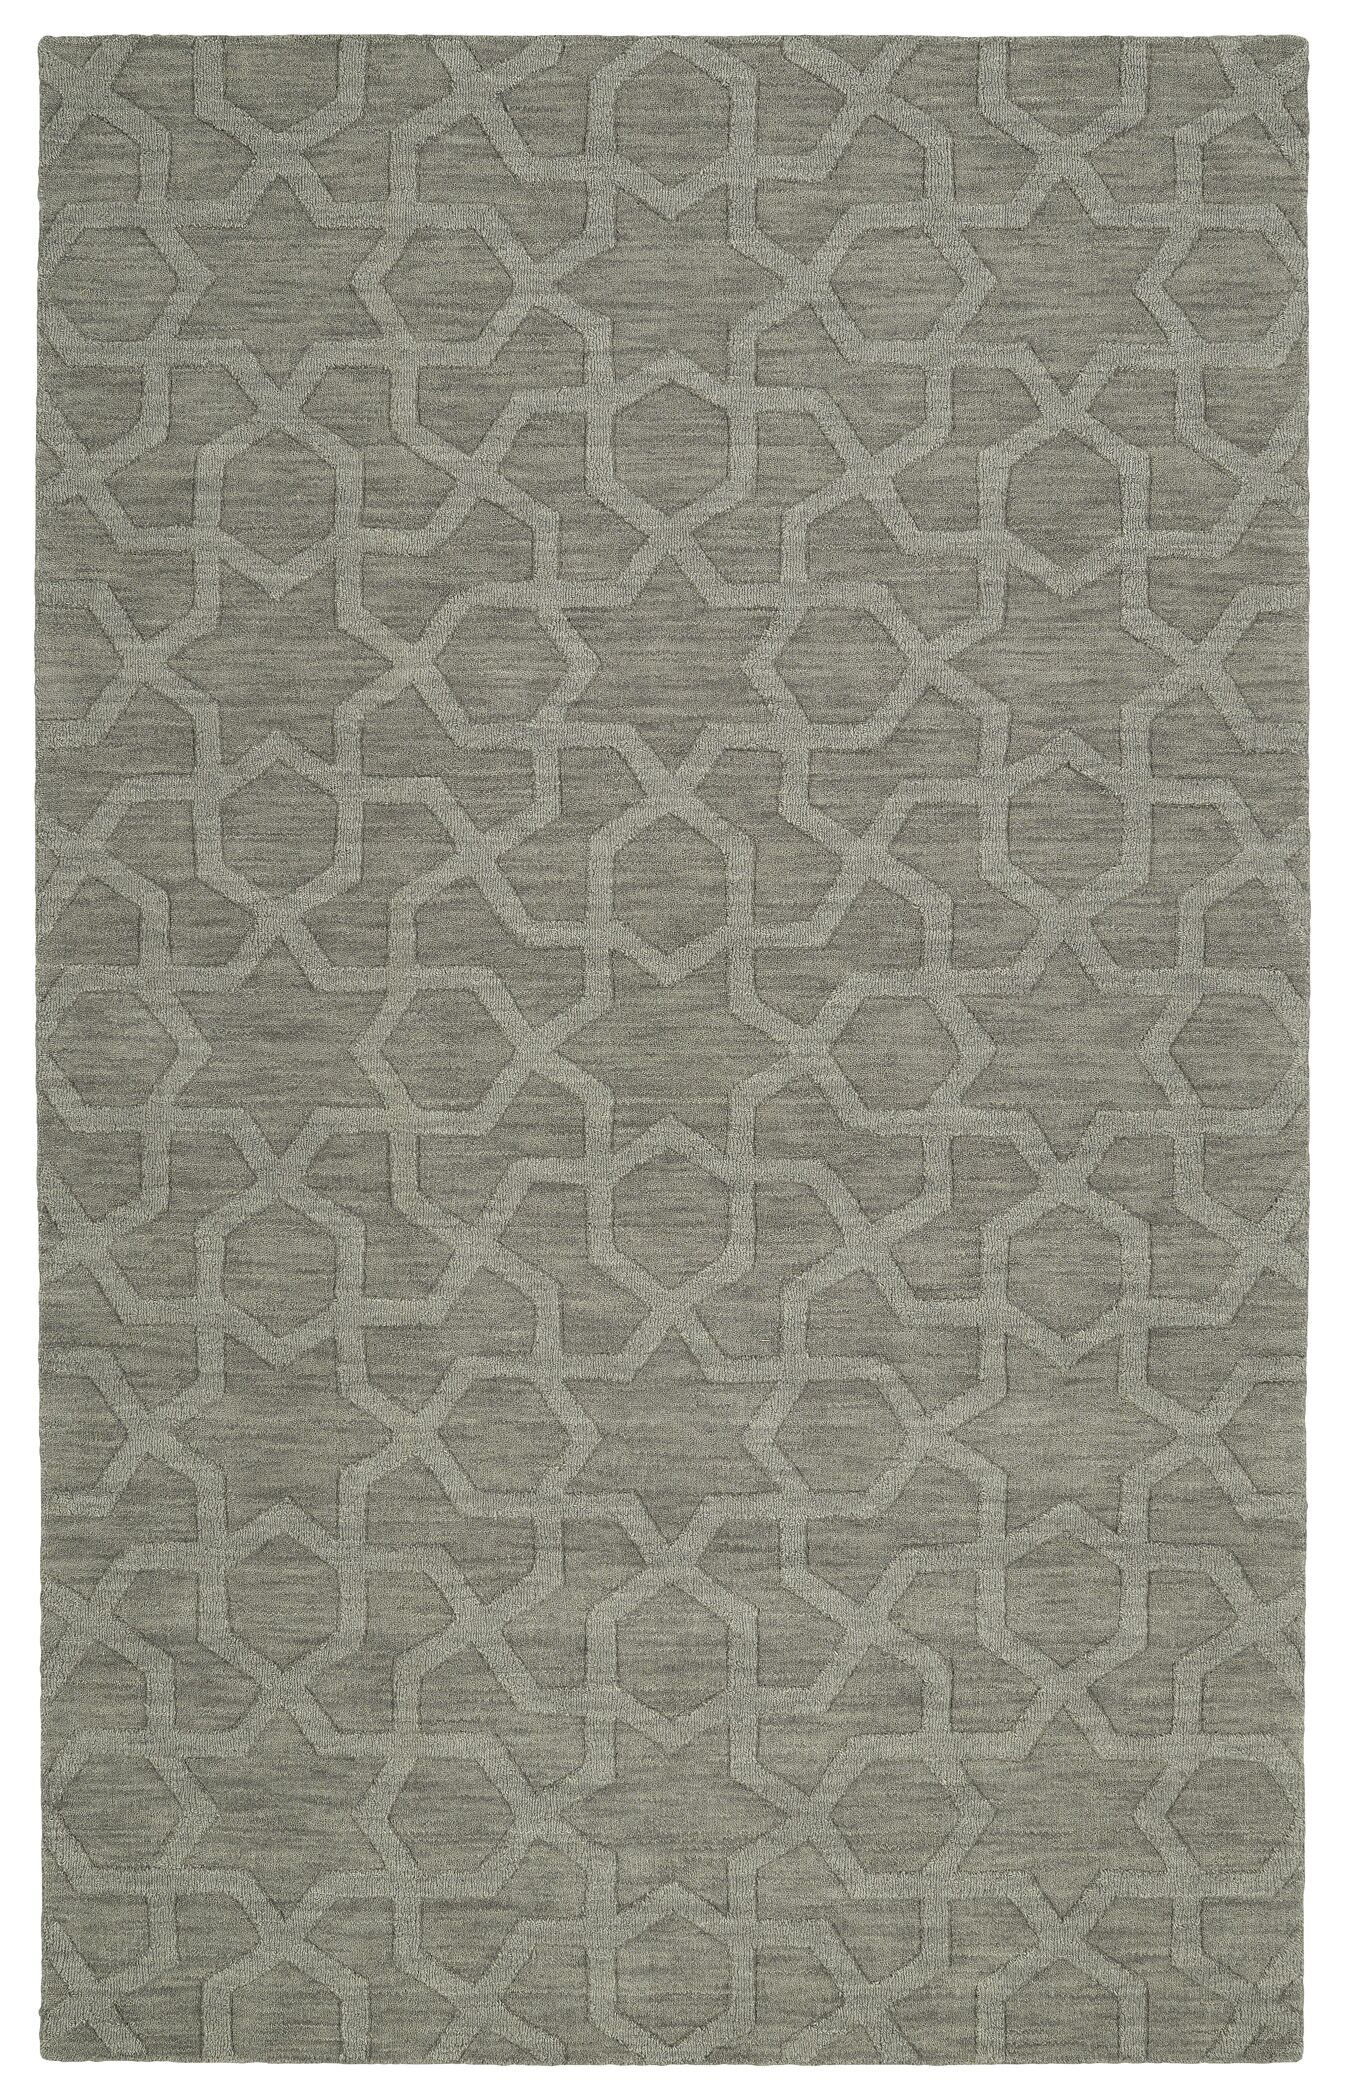 Dobson Handmade Gray Area Rug Rug Size: Rectangle 3'6